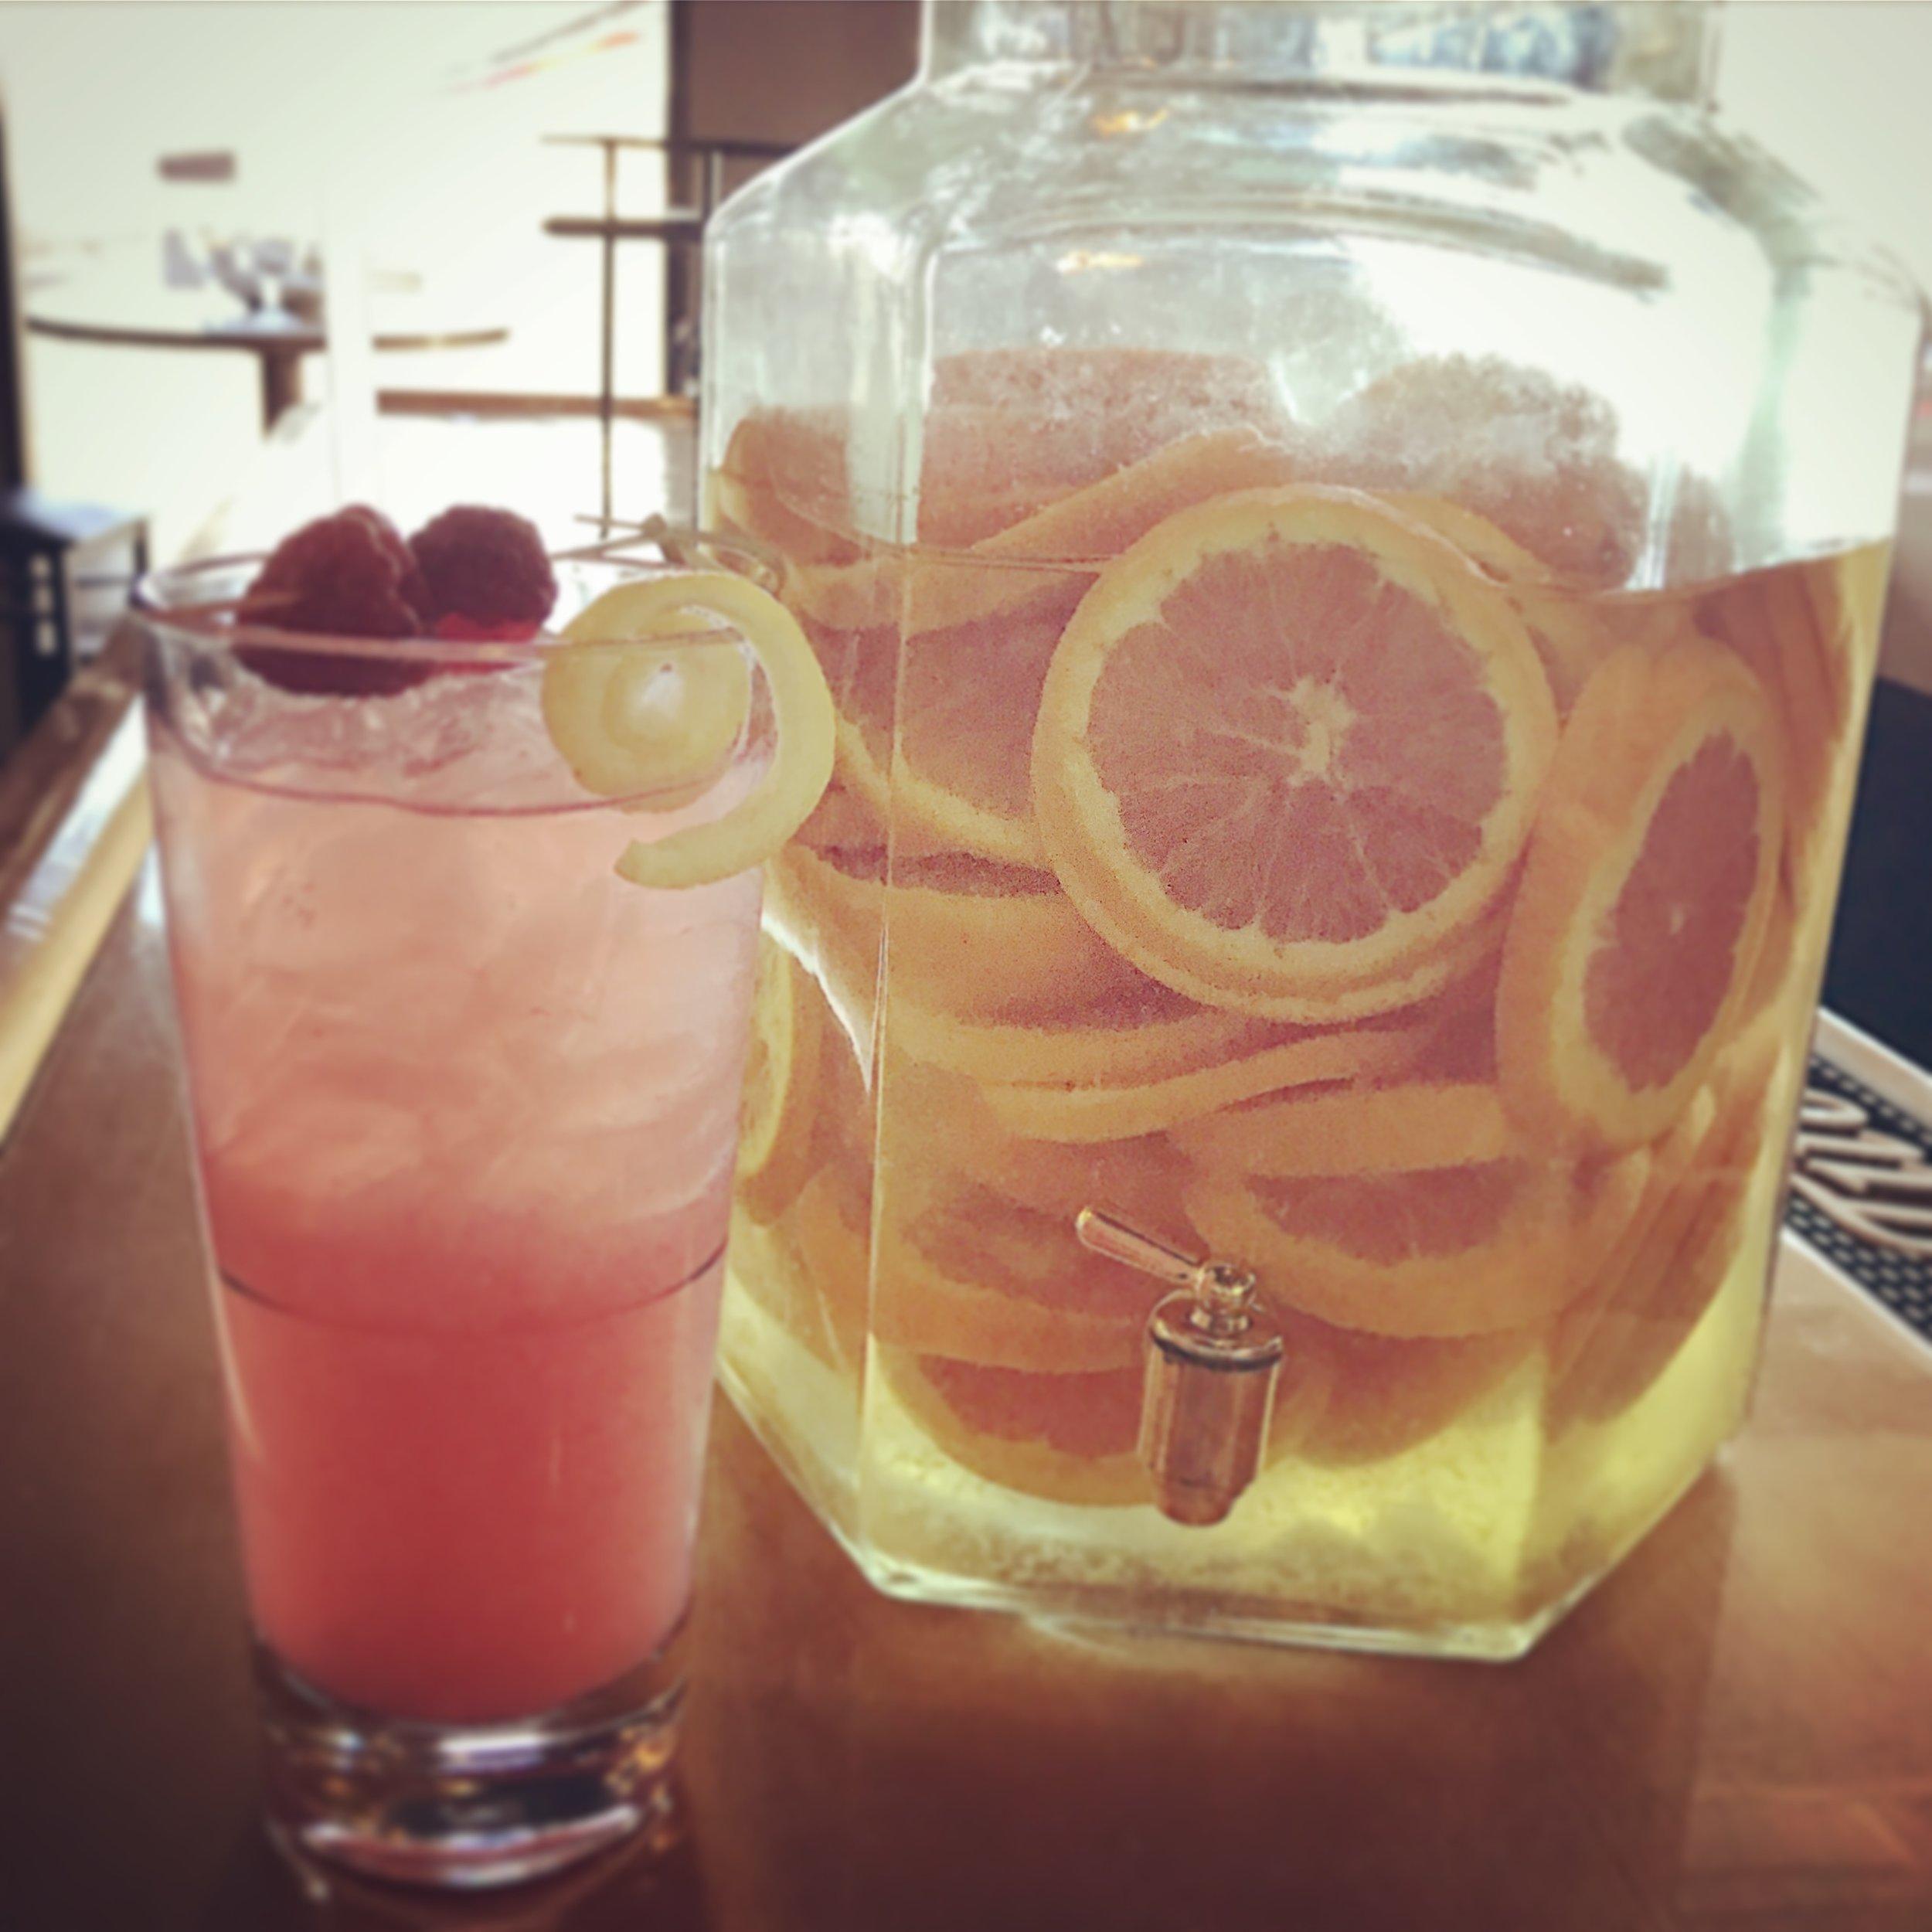 Cora Spiked Lemonade